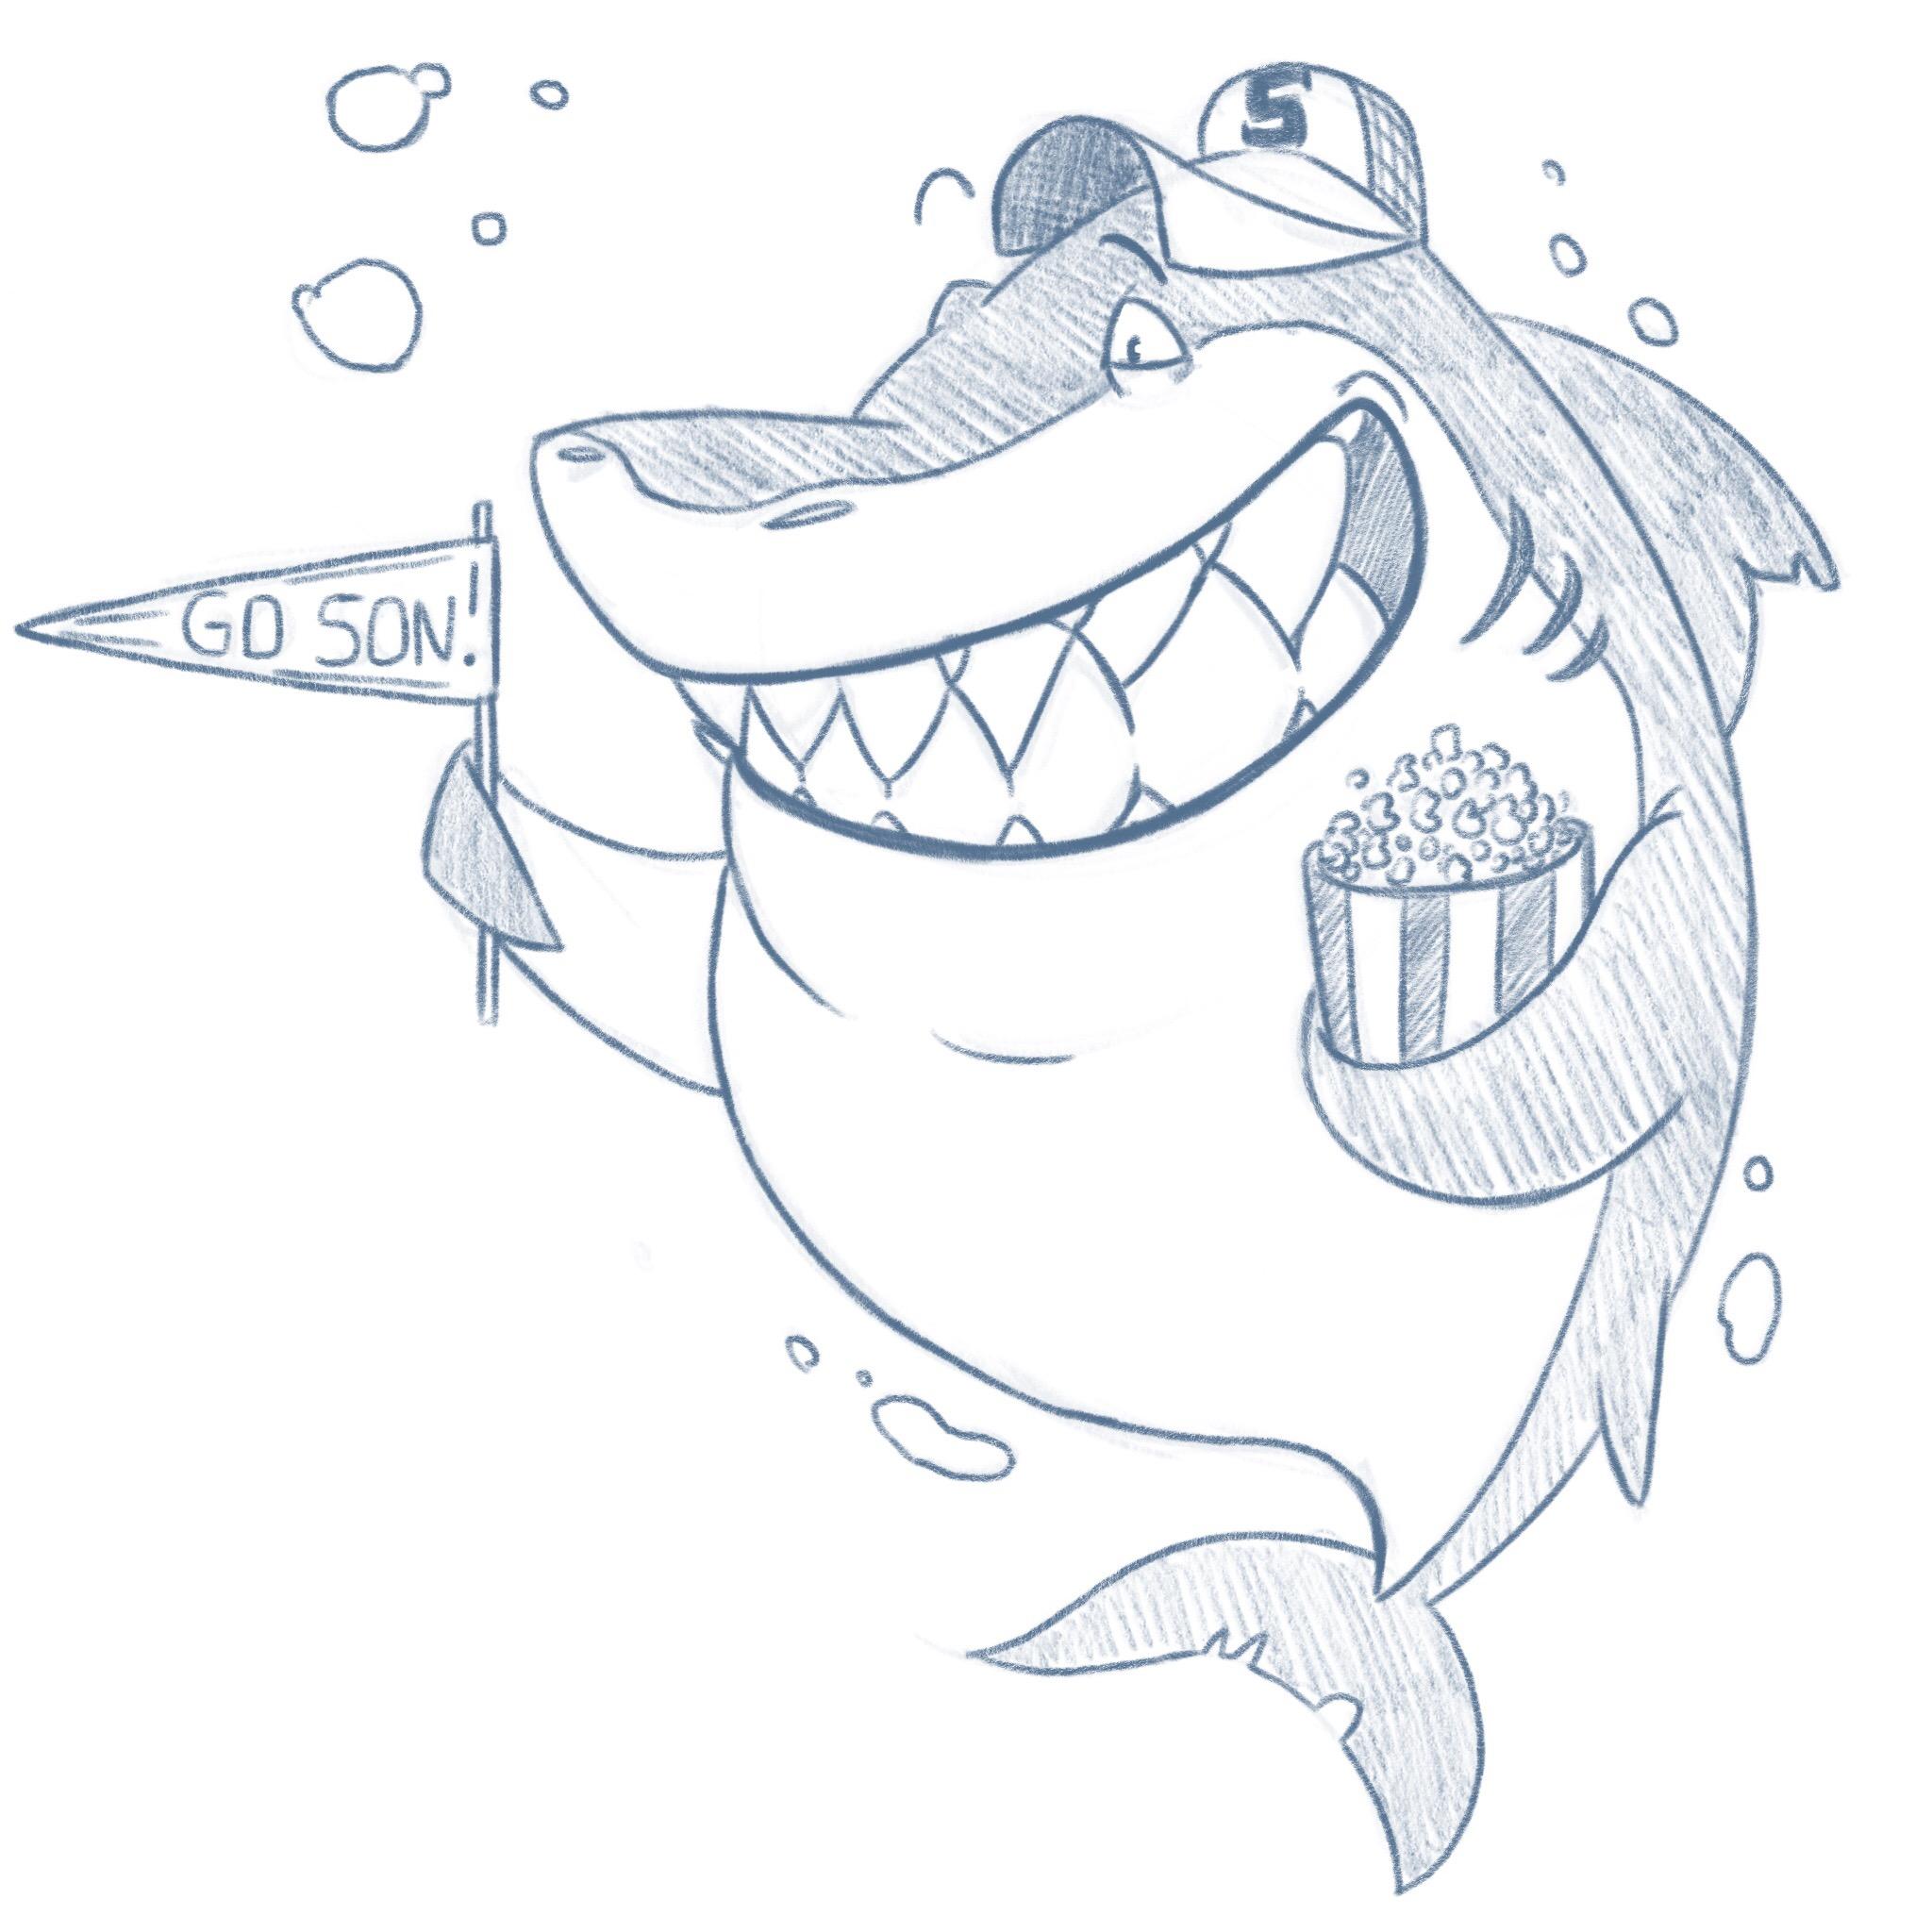 Shark daddy